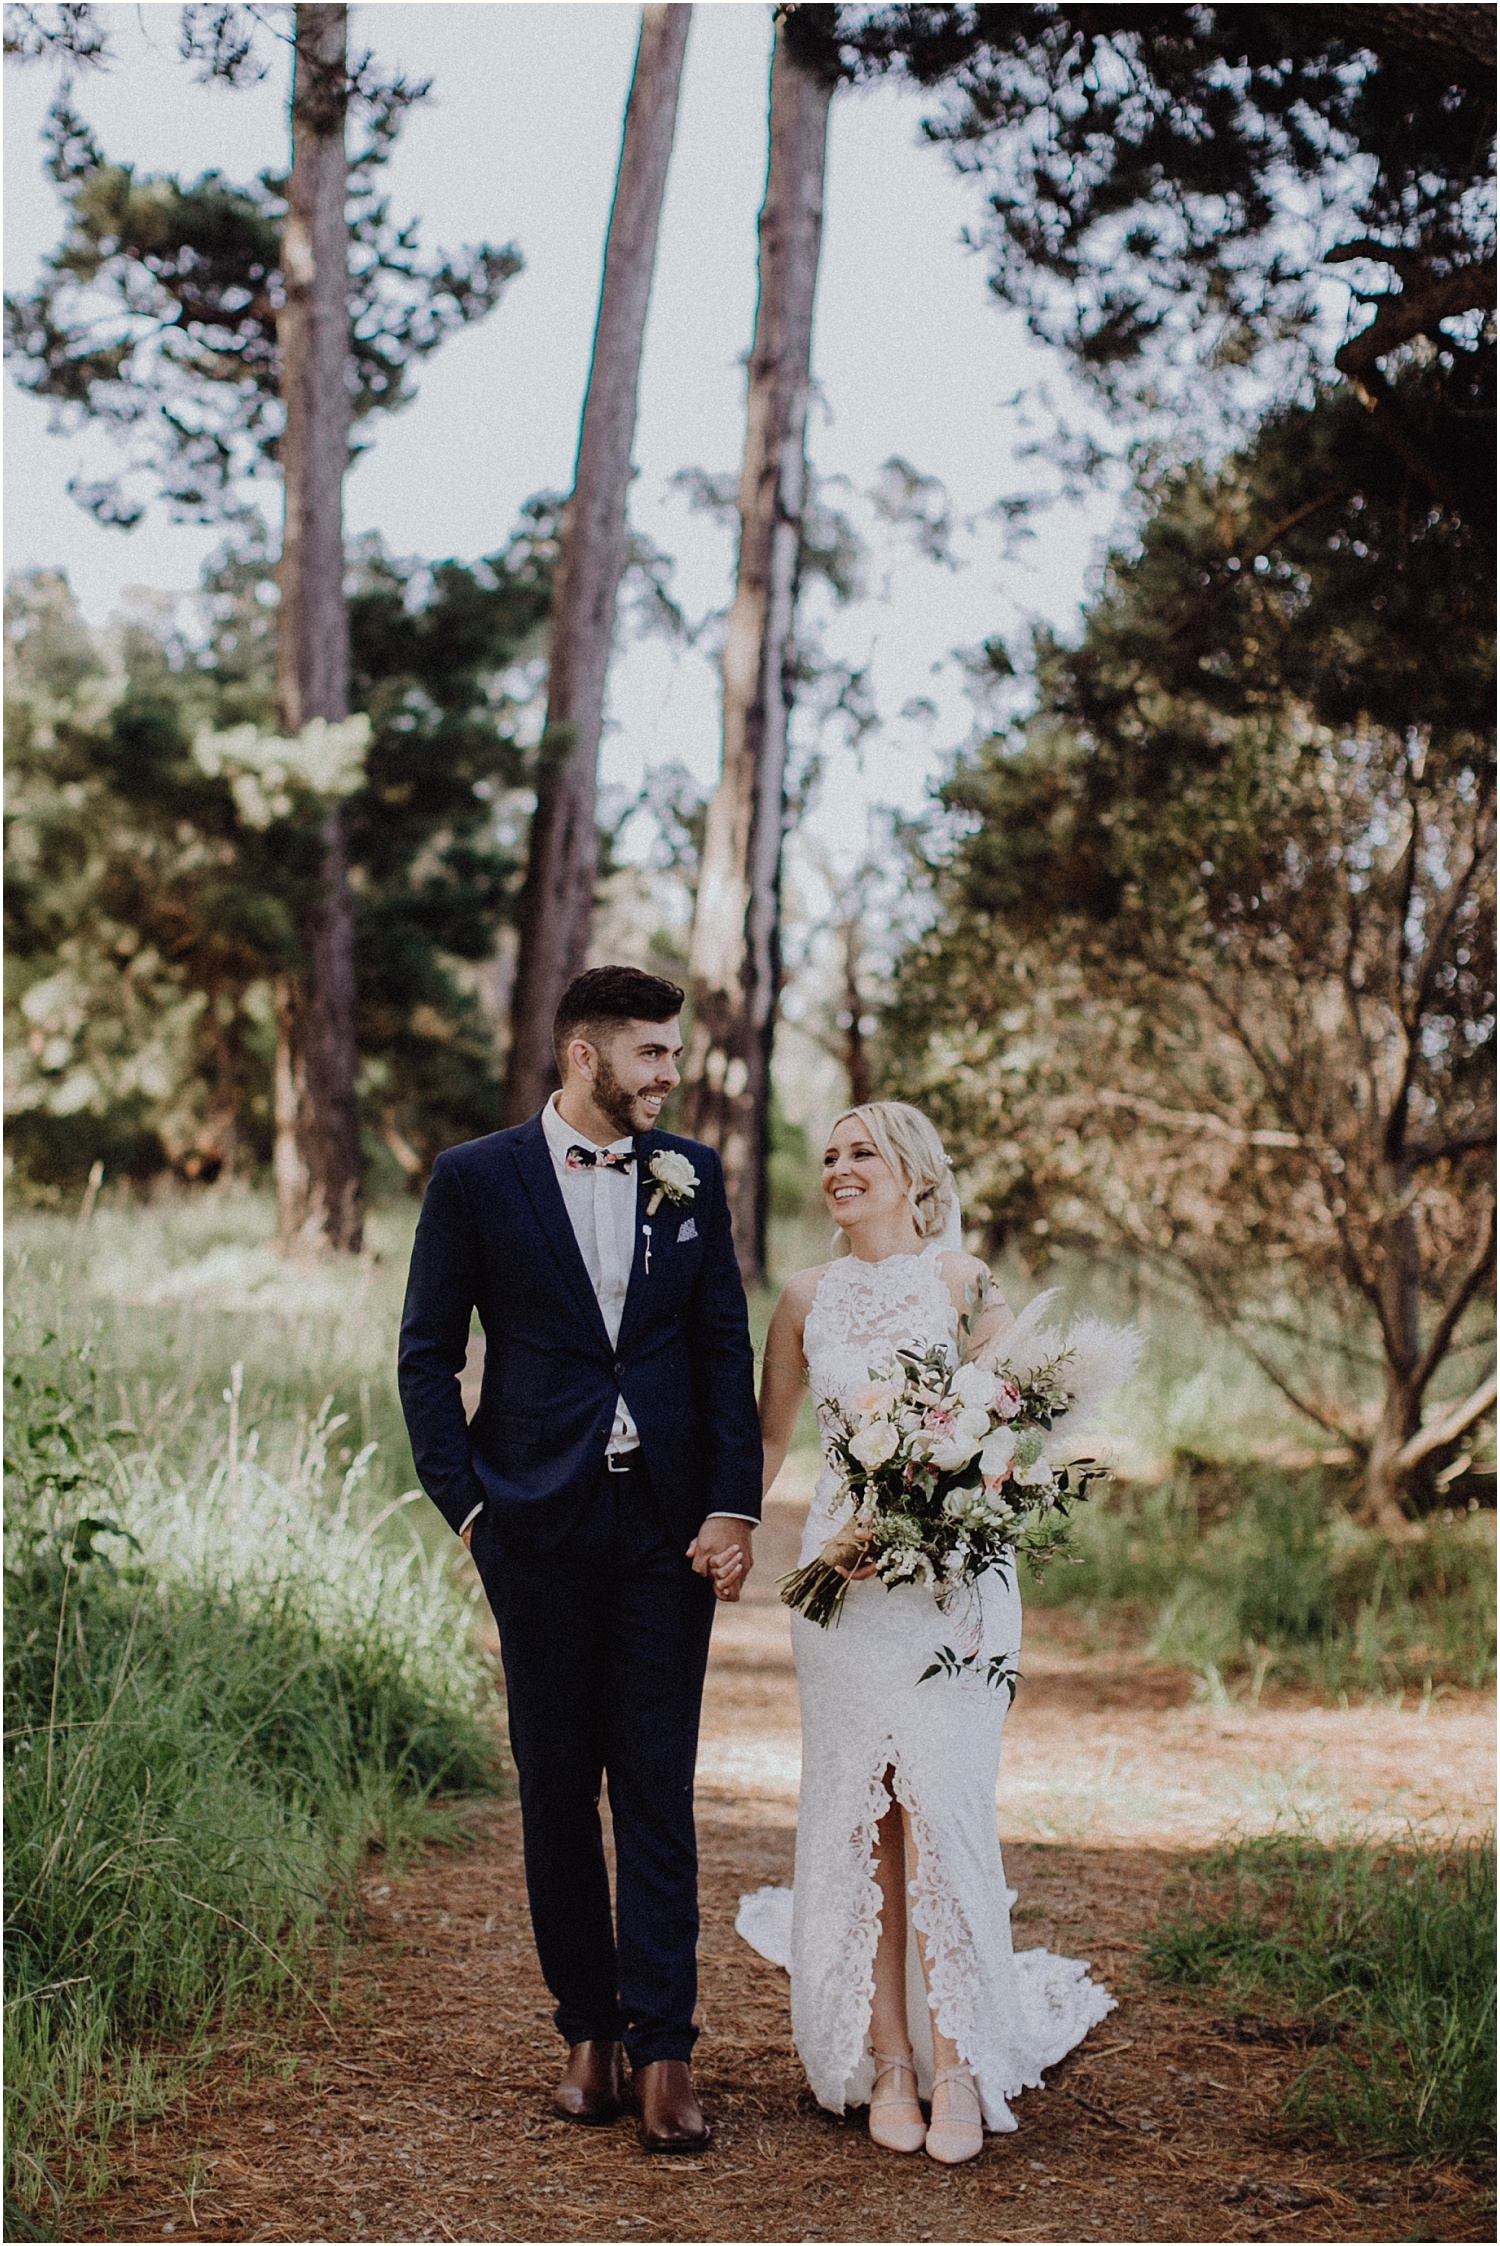 Nicolle and Damien's tipi wedding at the Flinders Yacht Club on the Mornington Peninsula._0127.jpg